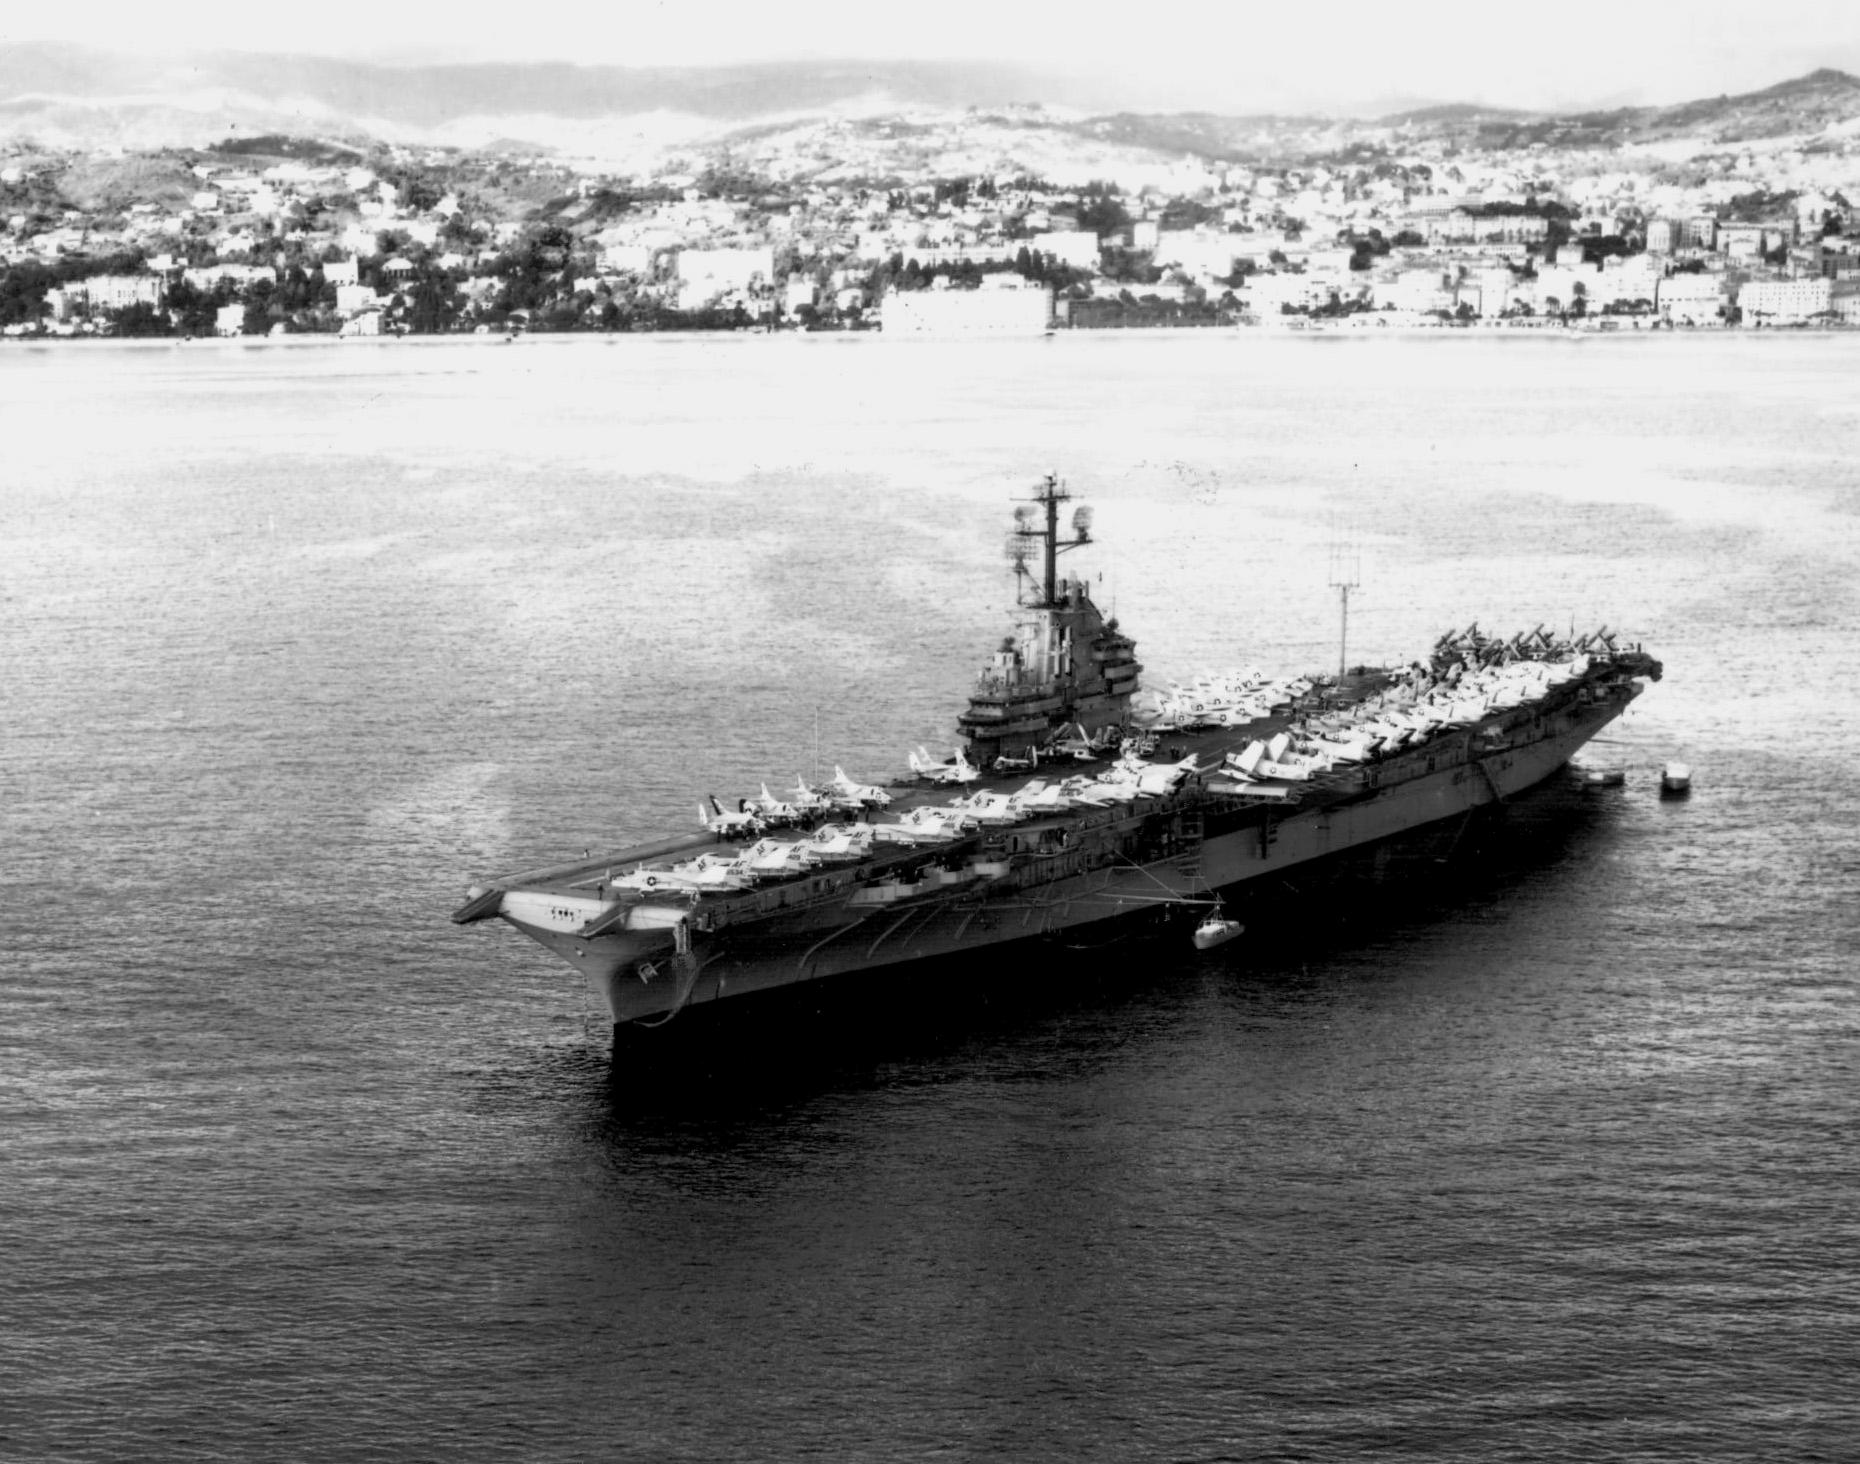 File:USS Intrepid (CVA-11) off Cannes 1961.jpeg - Wikimedia Commons